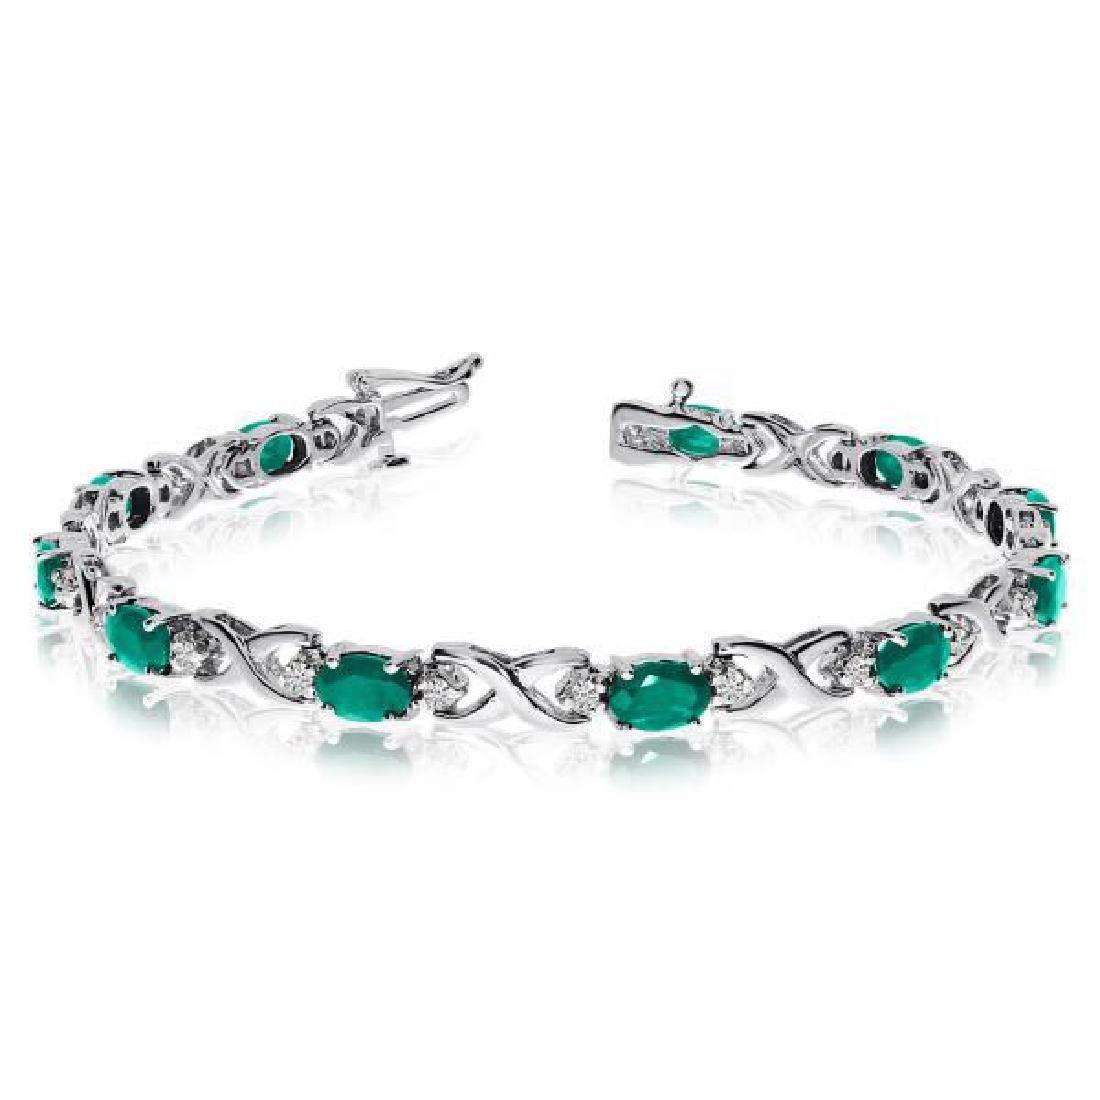 Oval Emerald and Diamond XOXO Link Bracelet 14k White G